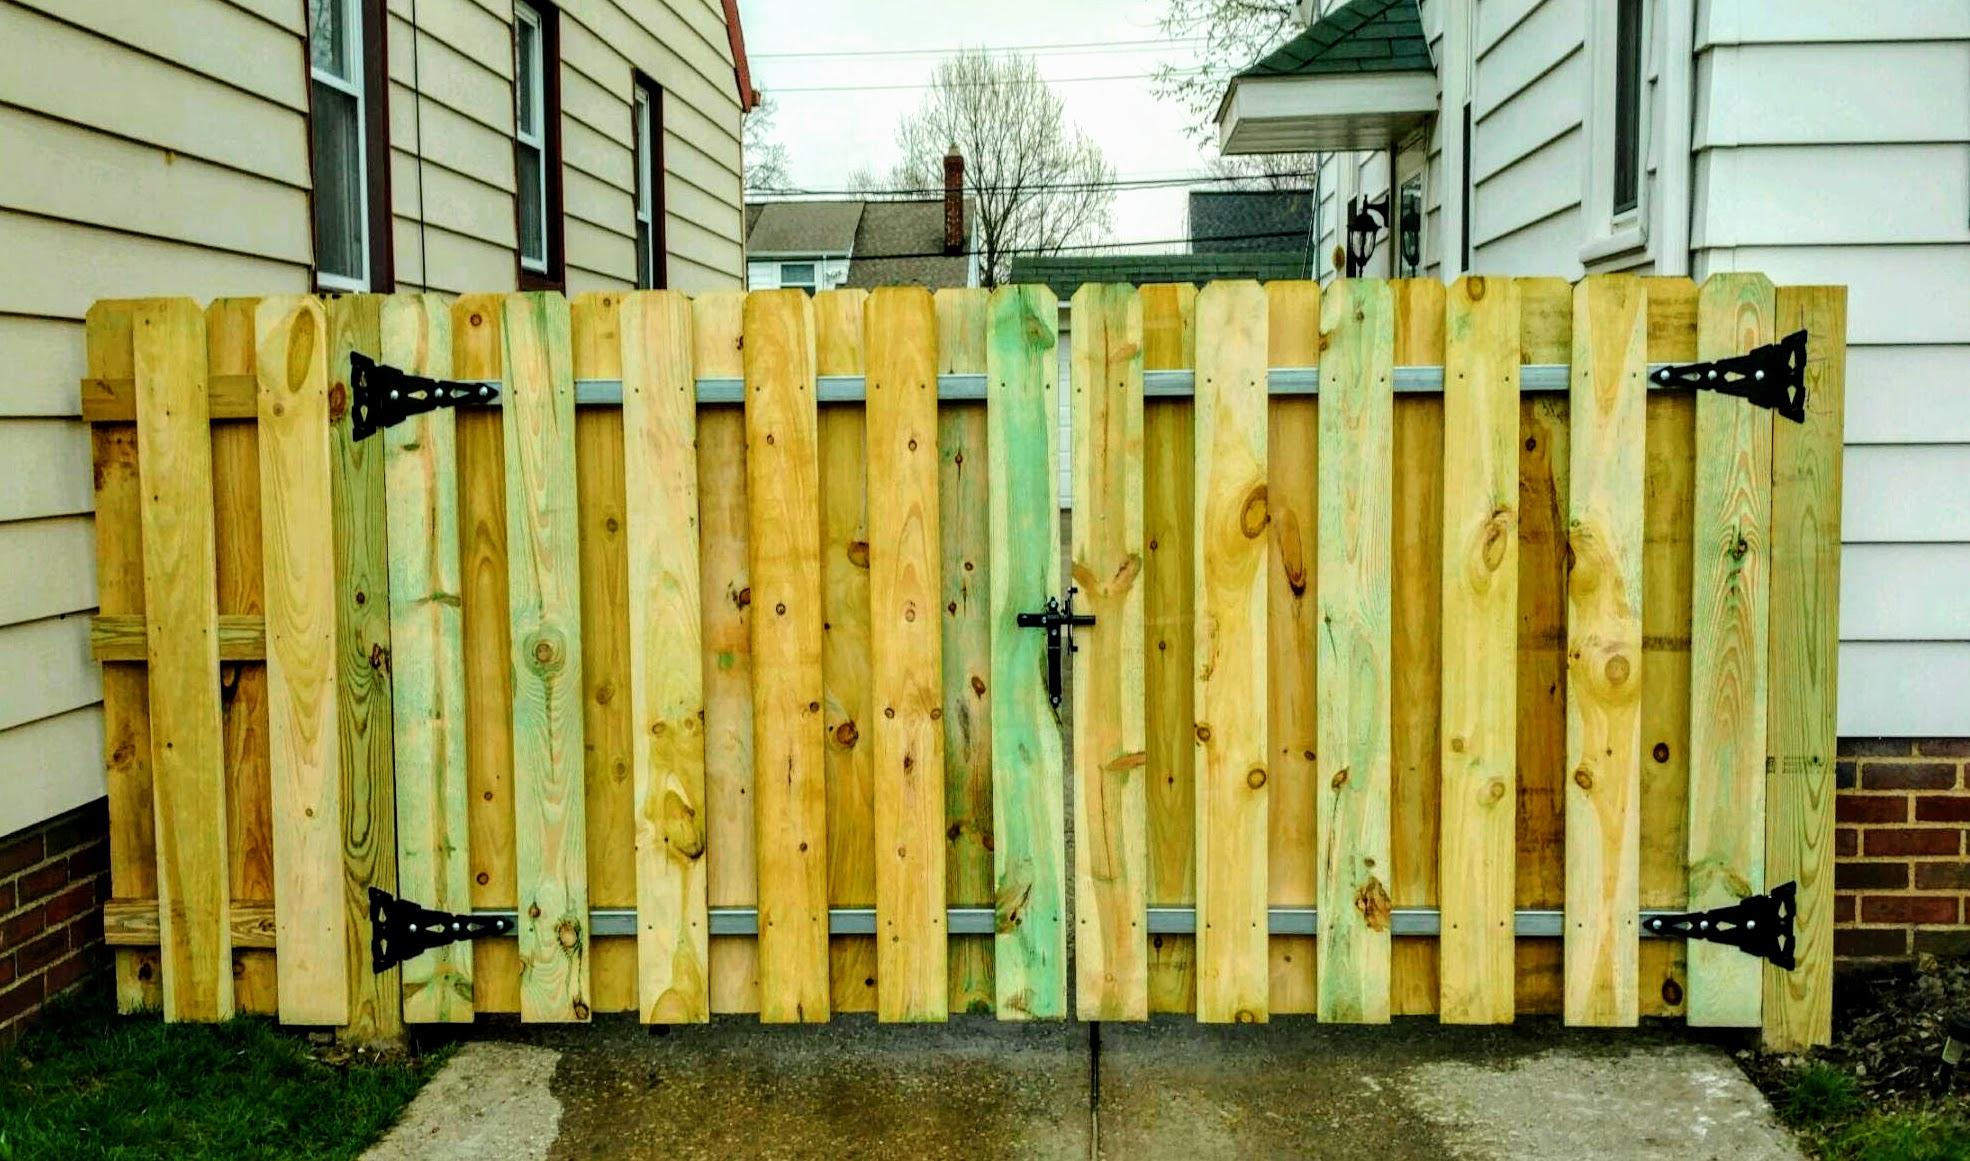 Fantastic Wood Shadow Box Driveway Gate Gates Fence Connection Picket Fence Gate Diy Picket Fence Gate Latch houzz-03 Picket Fence Gate